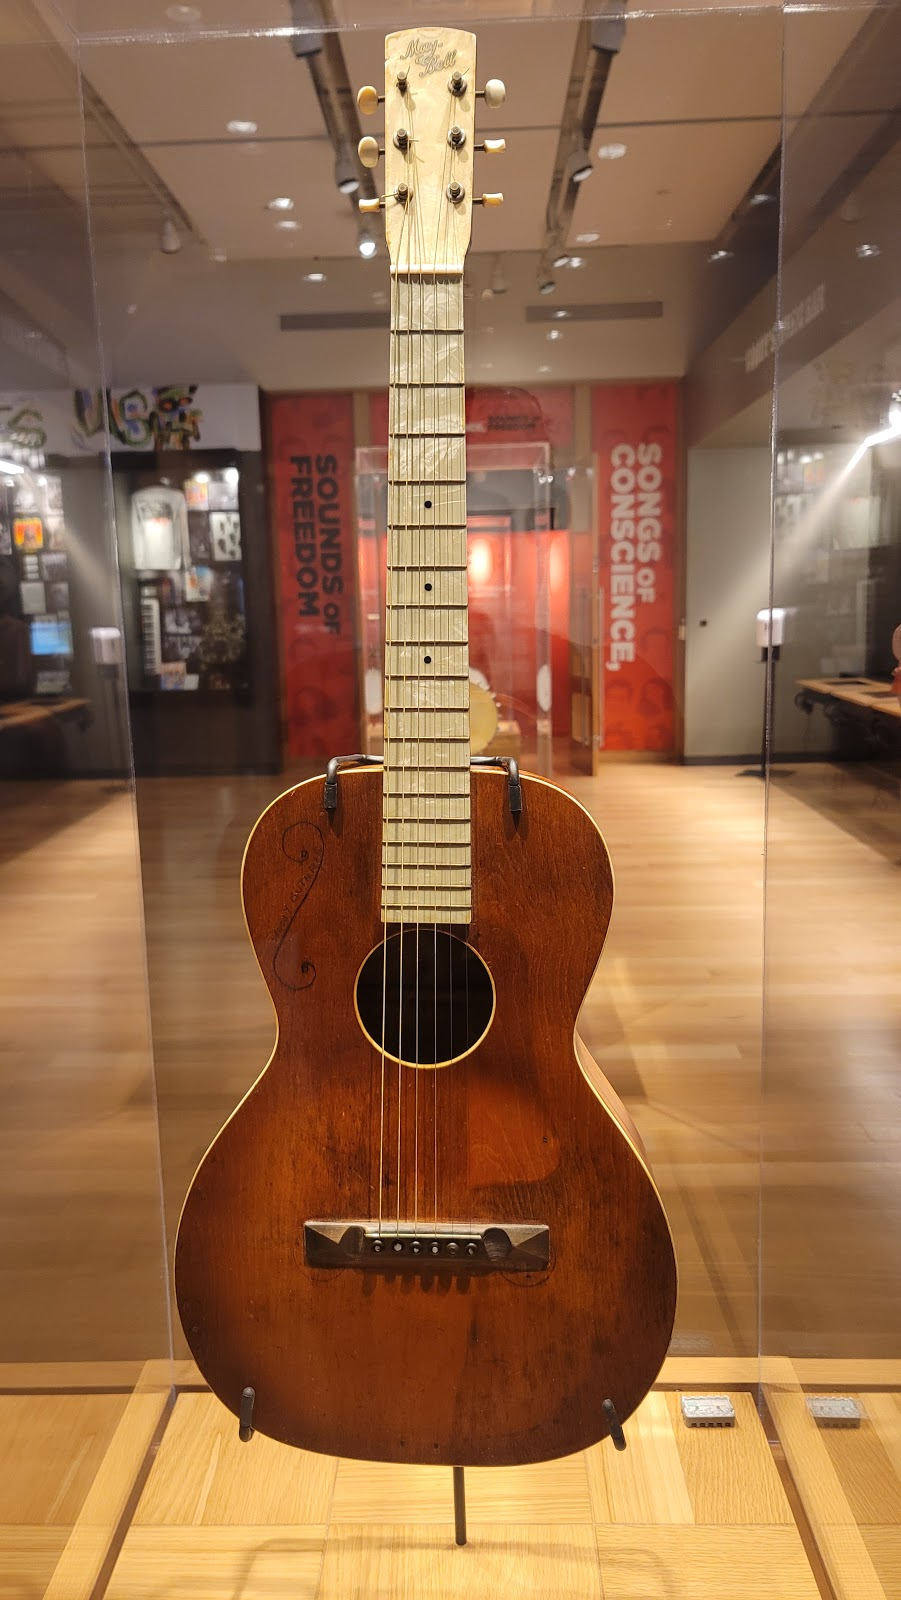 Woody Guthrie Center - museum    Photo 6 of 10   Address: 102 E Reconciliation Way, Tulsa, OK 74103, USA   Phone: (918) 574-2710